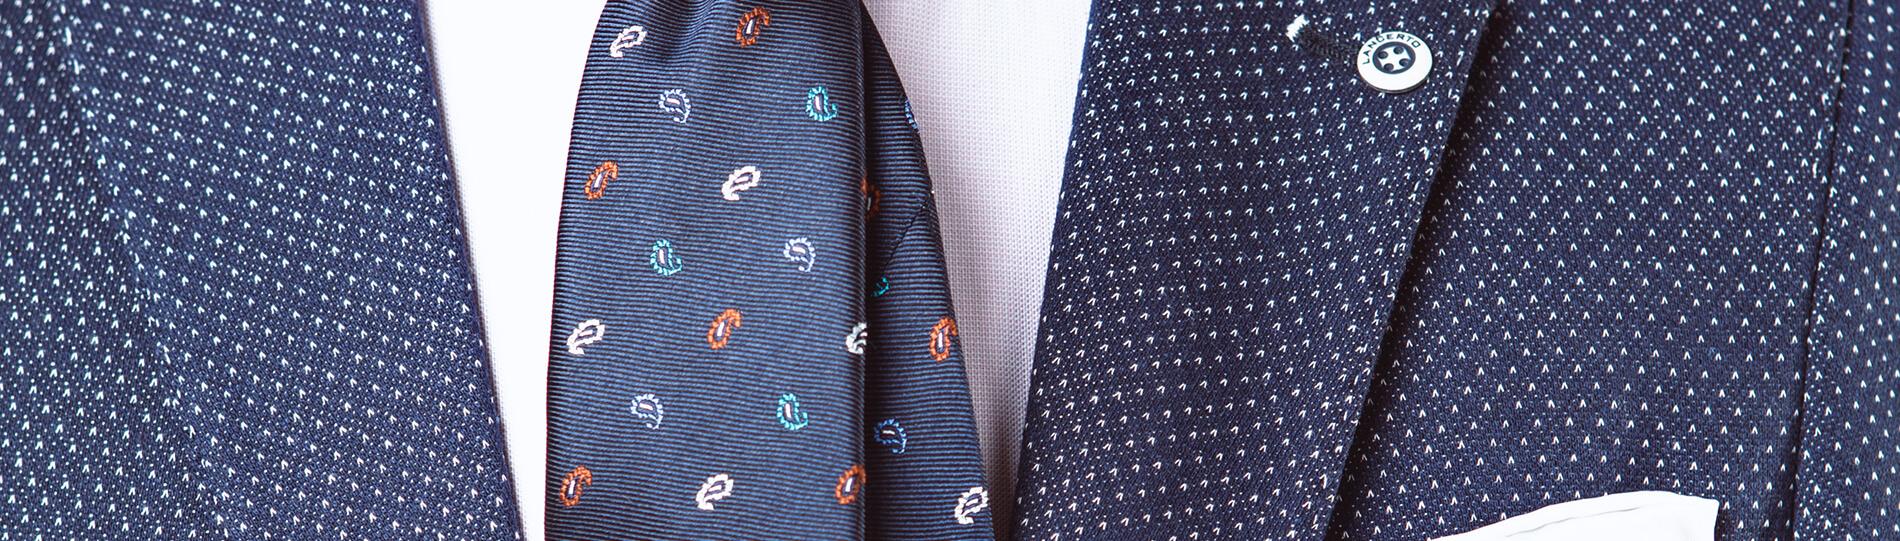 0fa4672359d52 Garnitur: podstawowe kolory. Jakie buty i krawat dobrać do garnituru